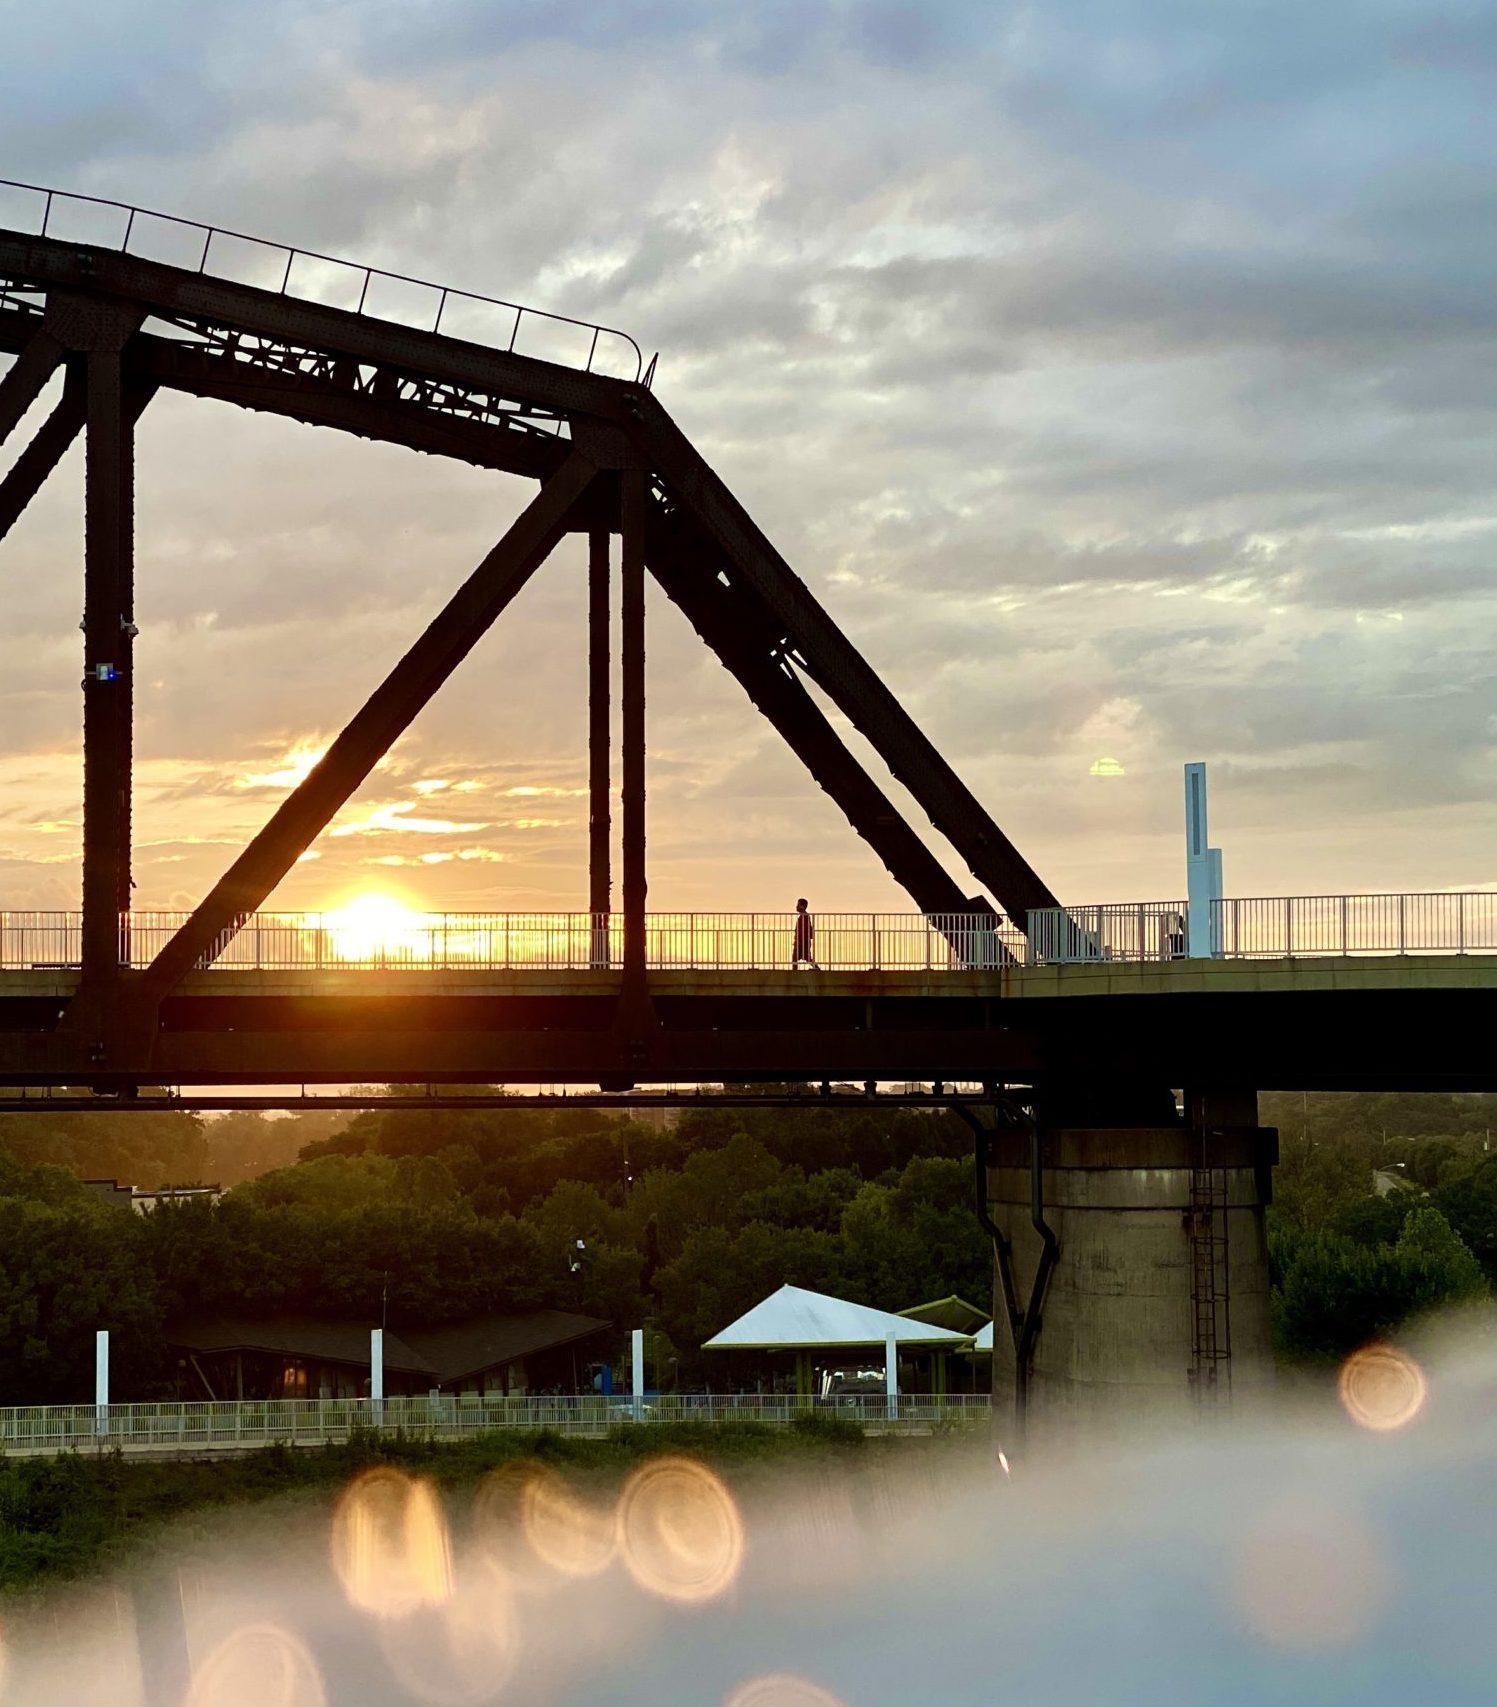 LIKE_runJMrun Big Four Bridge